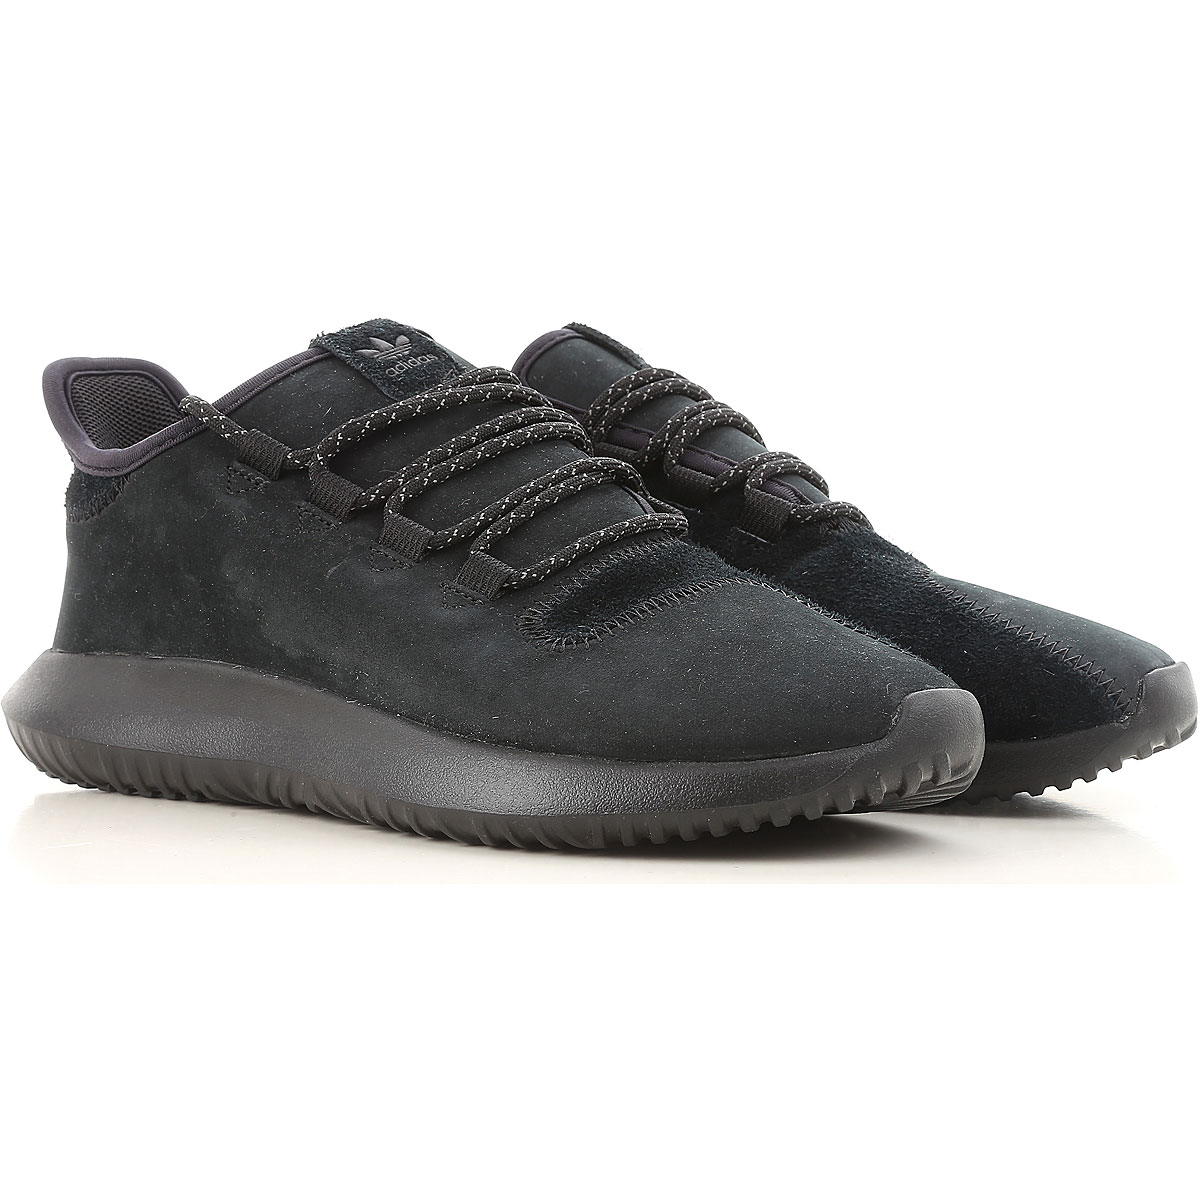 Image of Adidas Mens Shoes, Tubular Shadow, Black, Leather, 2017, US 7 - UK 6.5 - EU 40 US 9 - UK 8.5 - EU 42.5 US 10.5 - UK 10 - EU 44.5 US 8 1/2 - UK 8 - EU 42 US 9.5 - UK 9 - EU 43